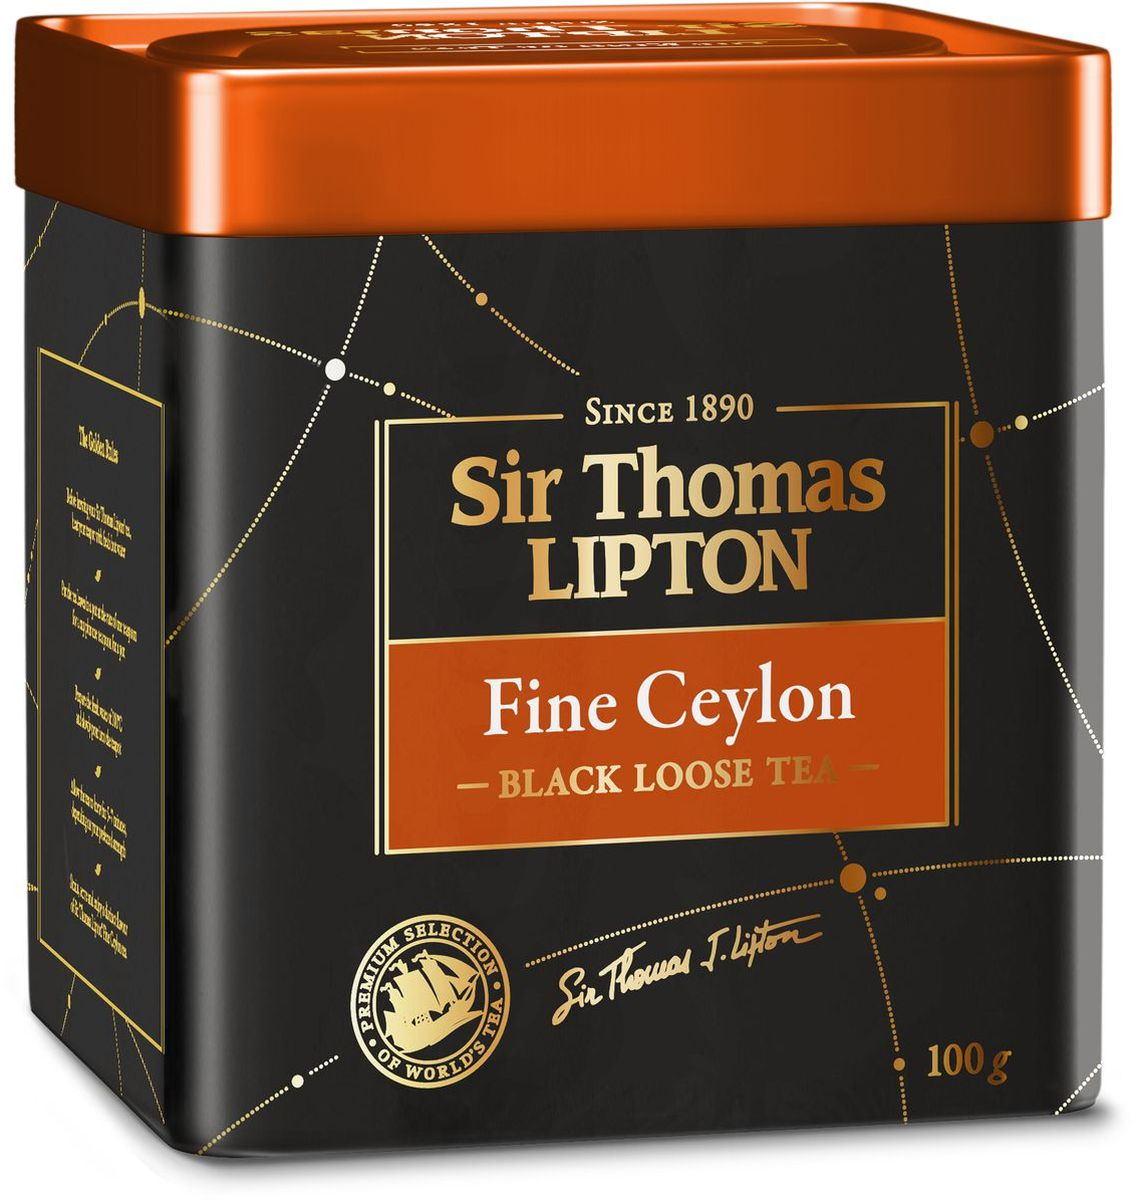 Sir Thomas Lipton Fine Ceylon чай черный листовой, 100 г листовой желатин 22 гр